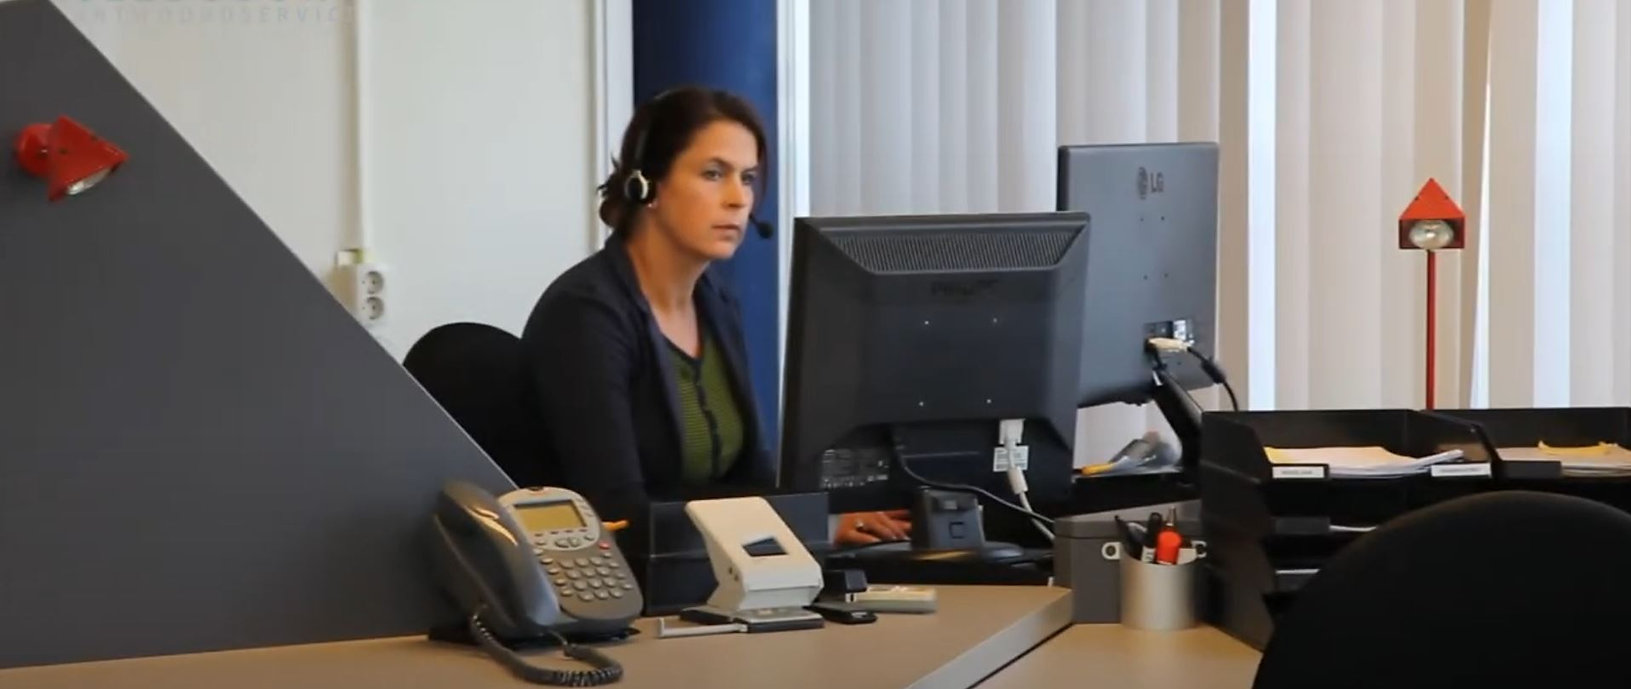 Telefoon antwoordservice.JPG